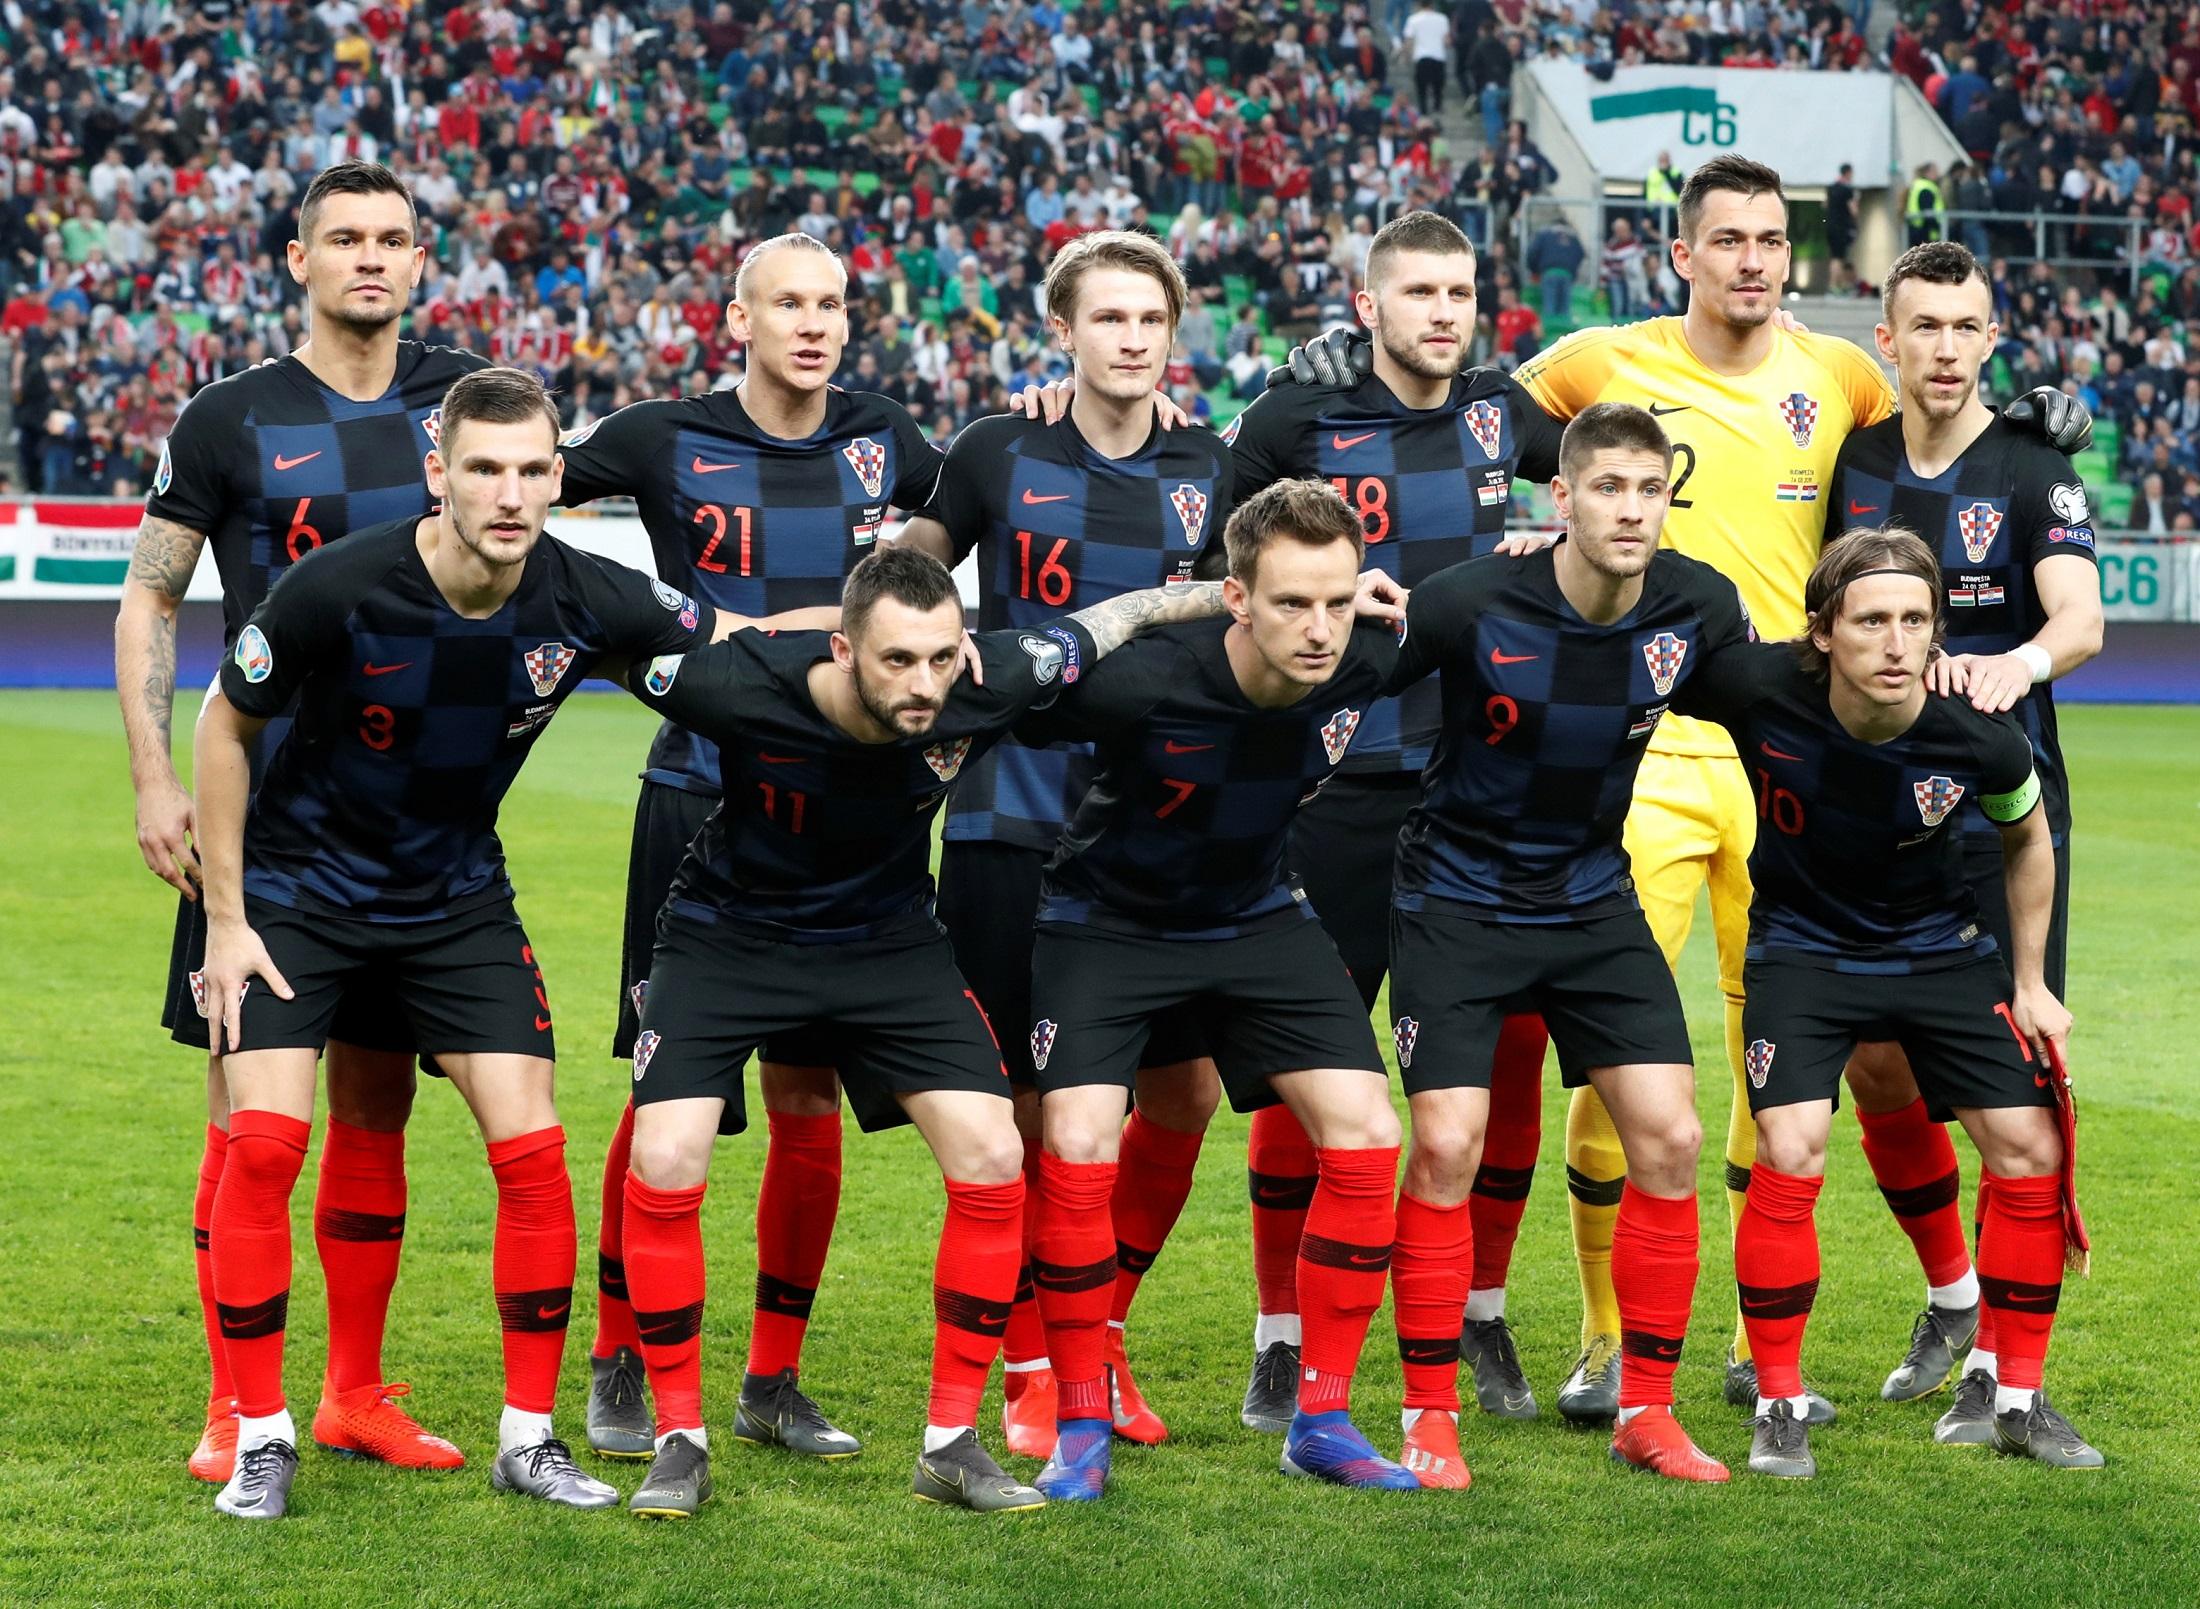 Soccer Football - Euro 2020 Qualifier - Group E - Hungary v Croatia - Groupama Arena, Budapest, Hungary - March 24, 2019  Croatia players pose for a team group photo before the match   REUTERS/Bernadett Szabo - RC116F49F310